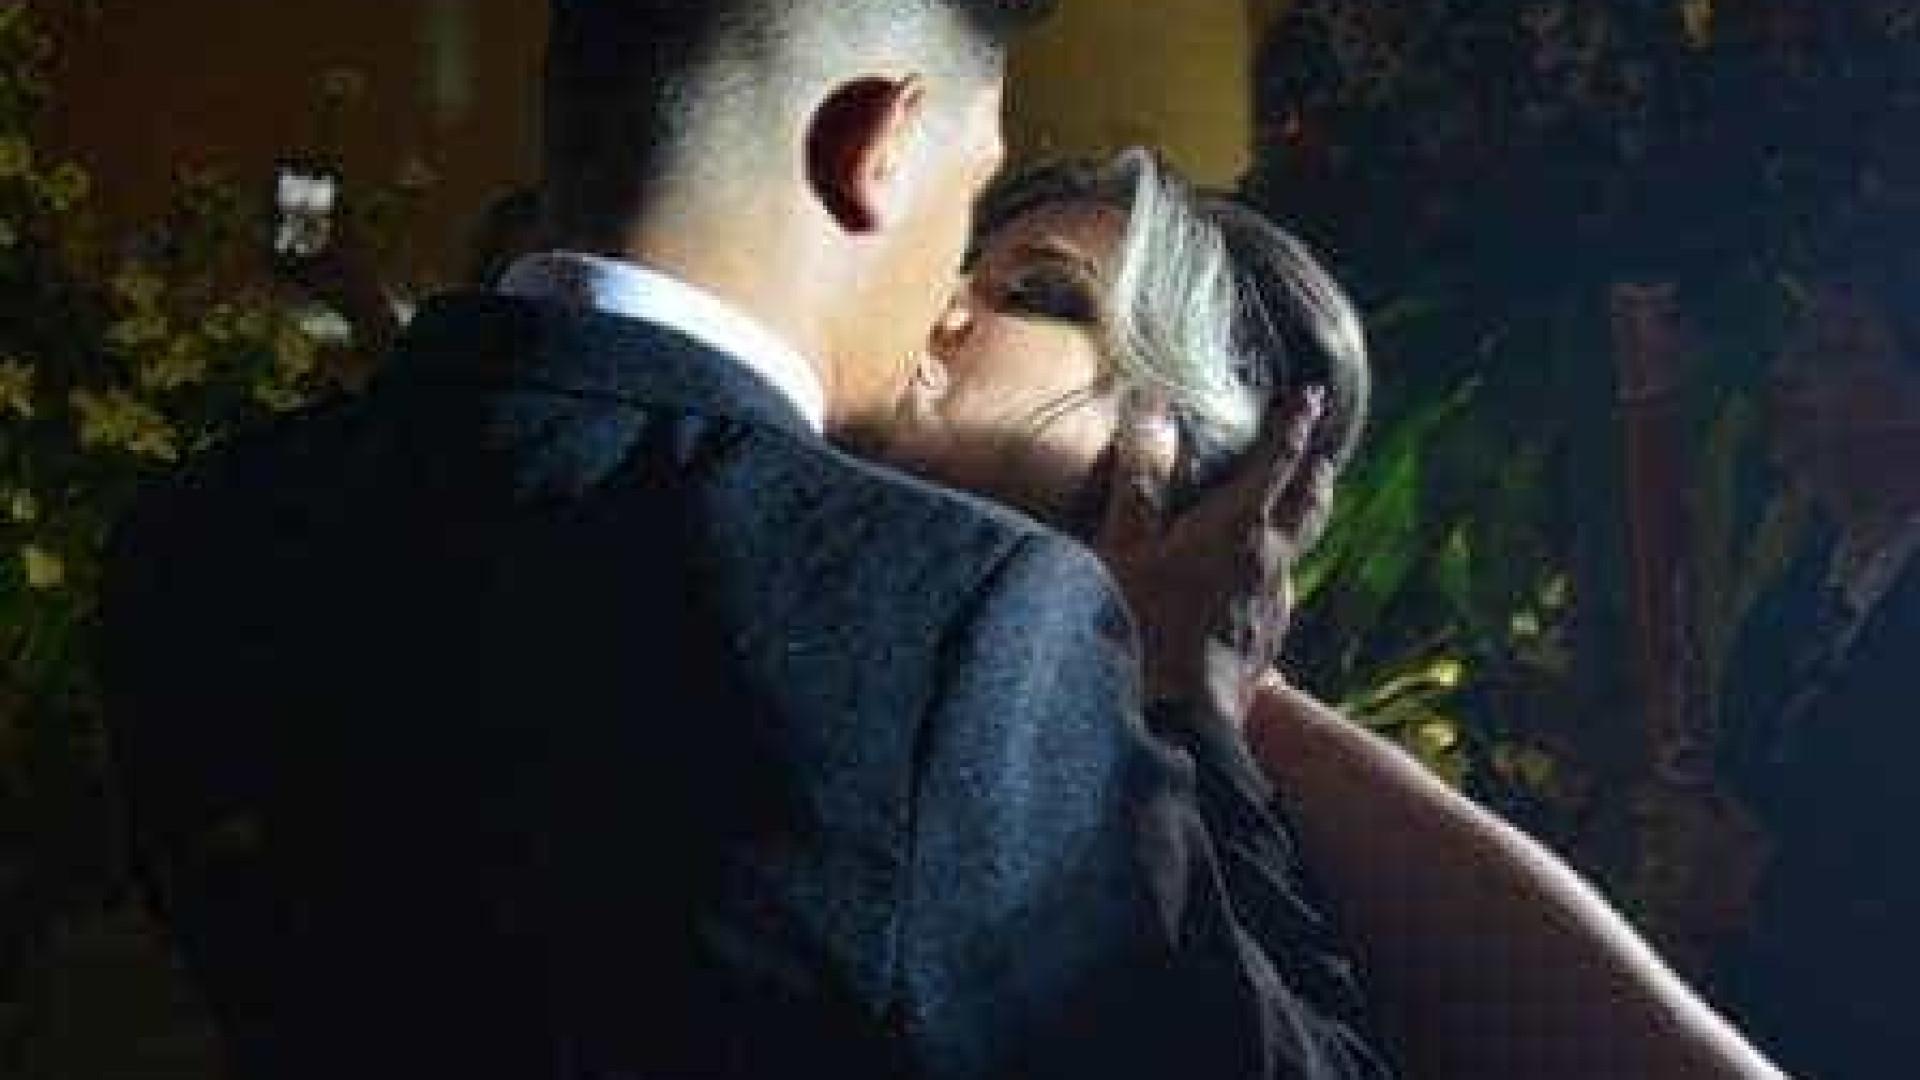 Casal de noivos é assaltado após festa de casamento em Fortaleza